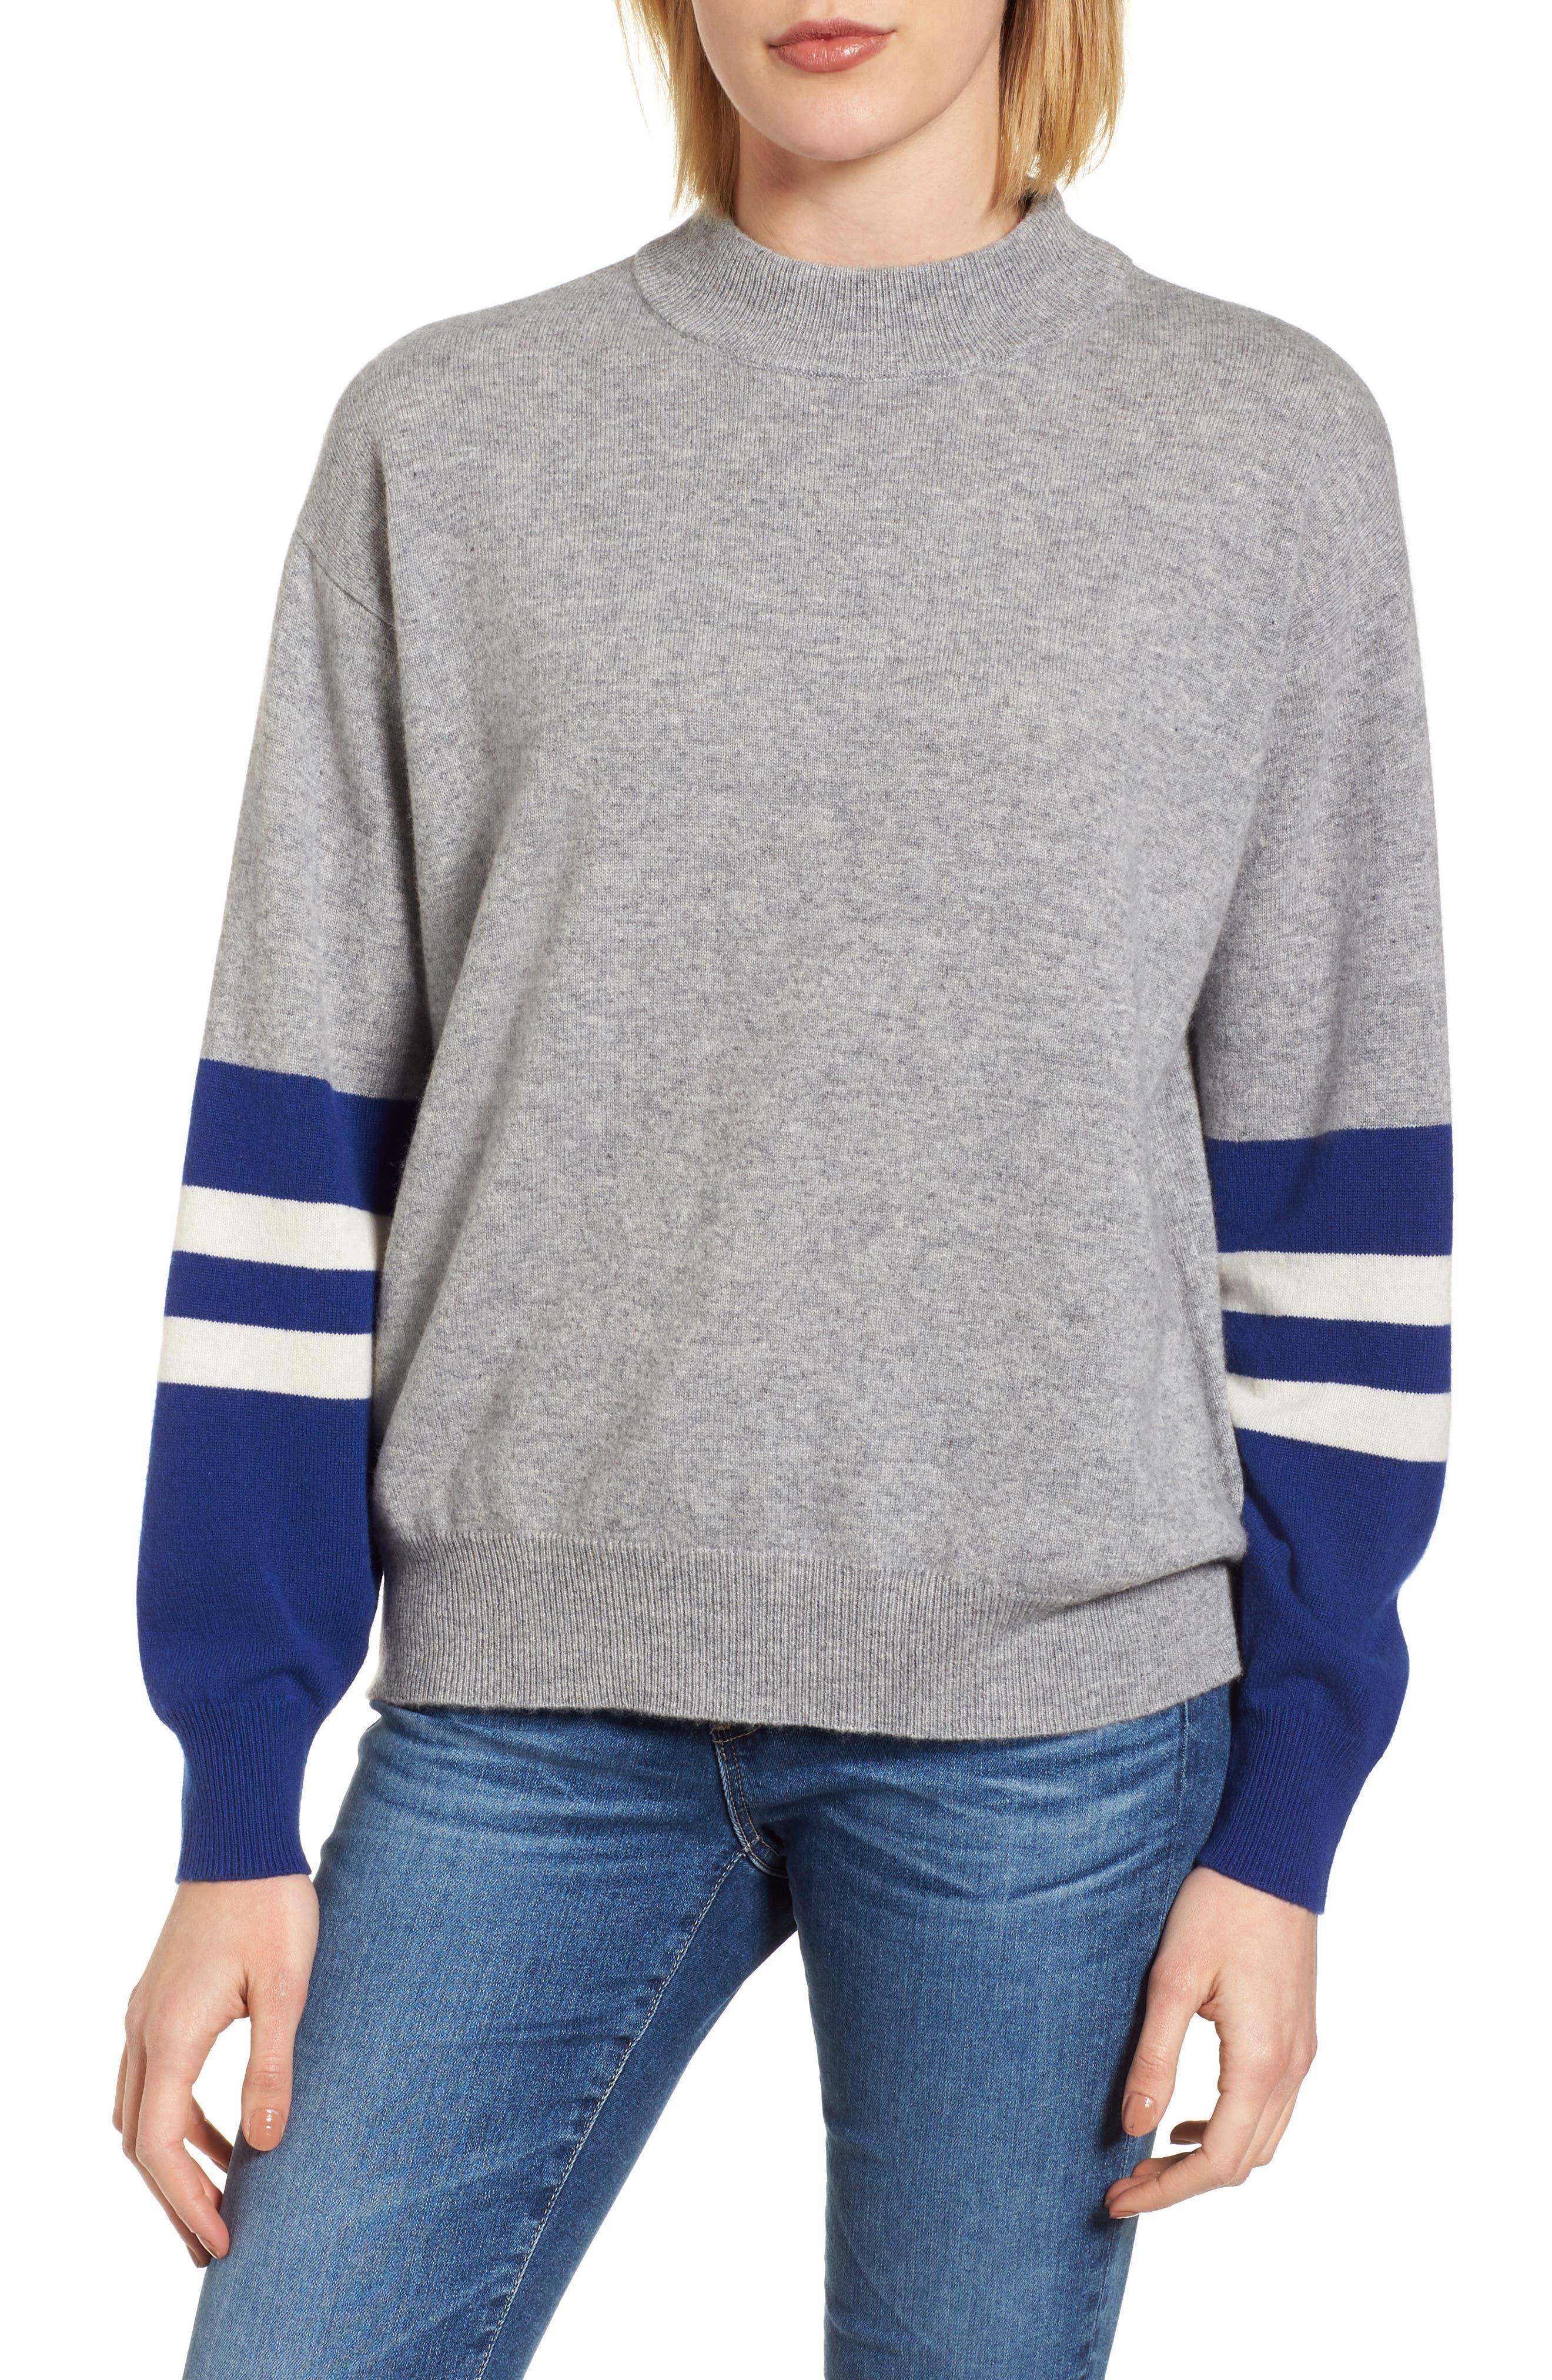 Colorblock Cashmere Sweater,                         Main,                         color, HEATHER GREY